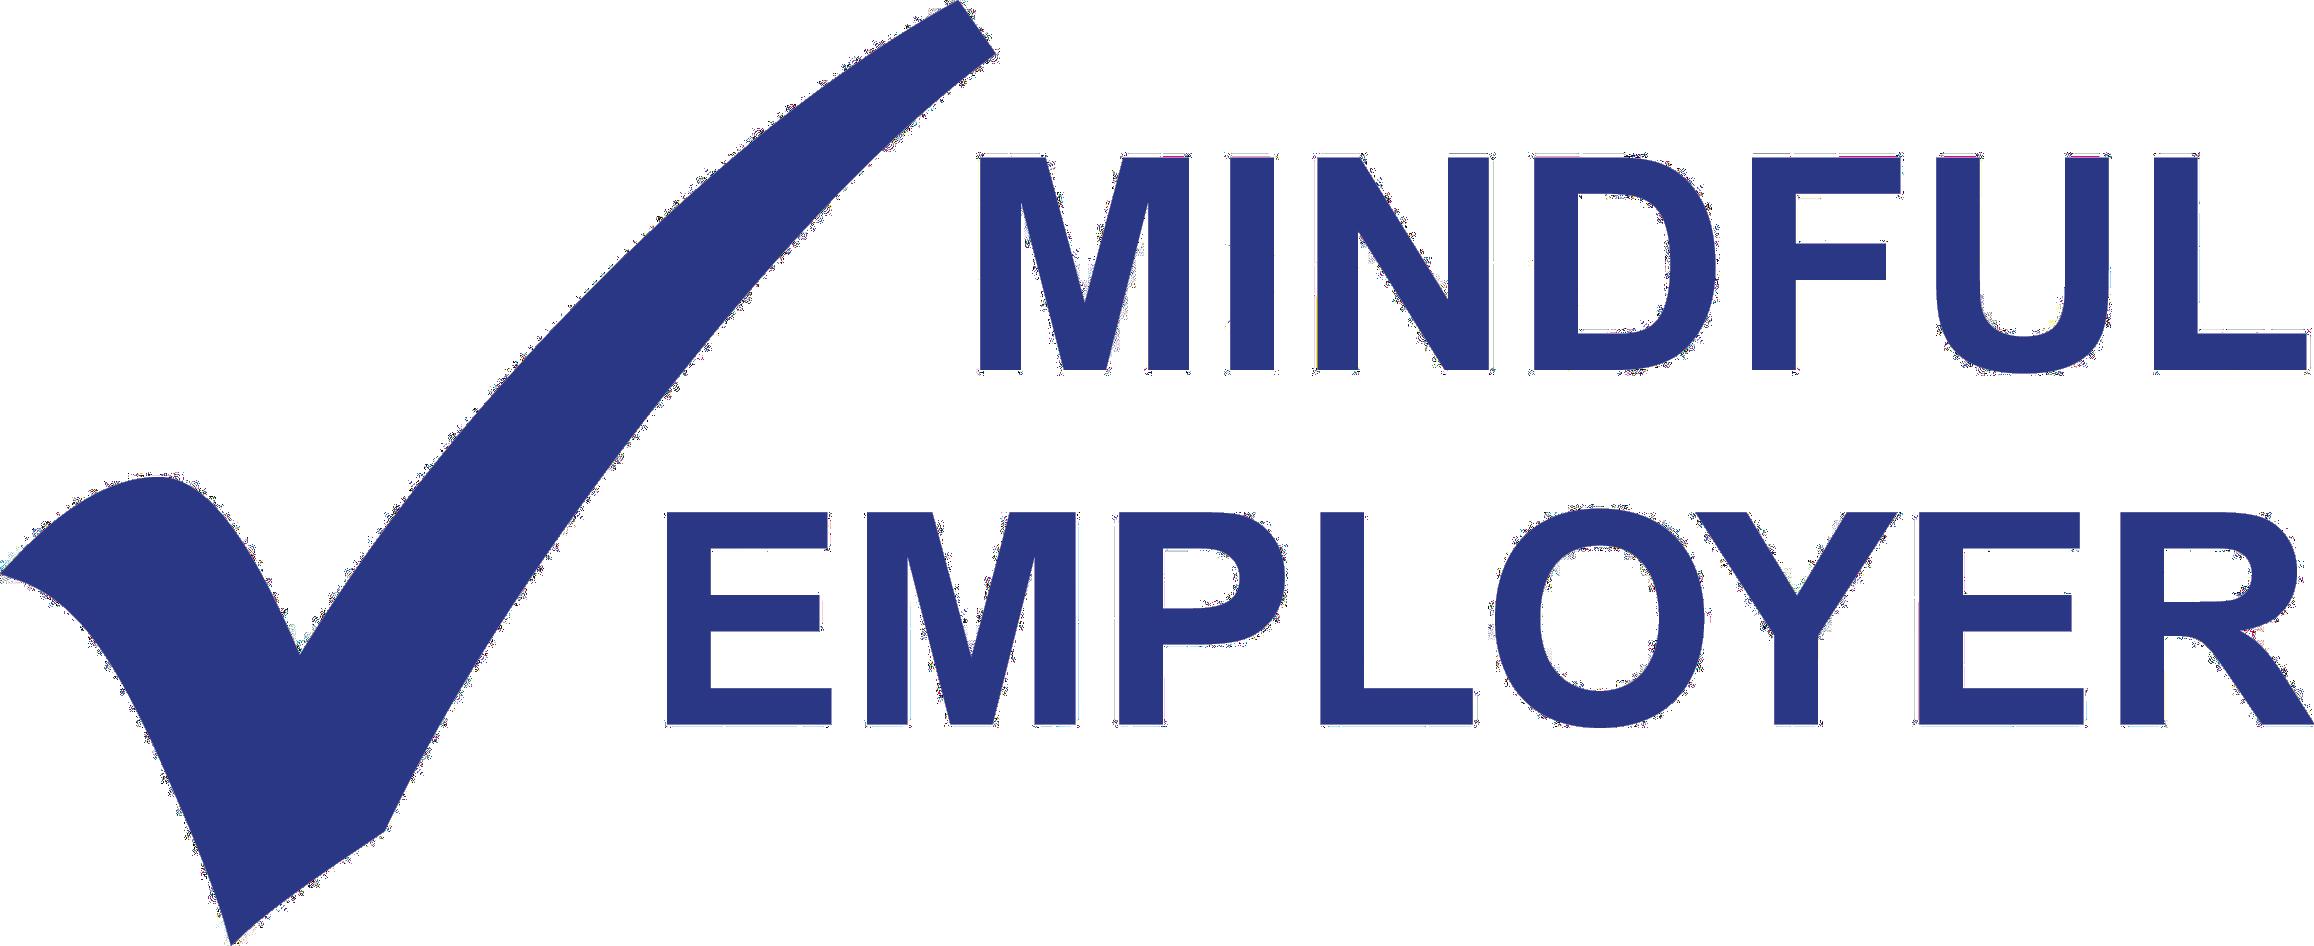 Mindful employer charter logo